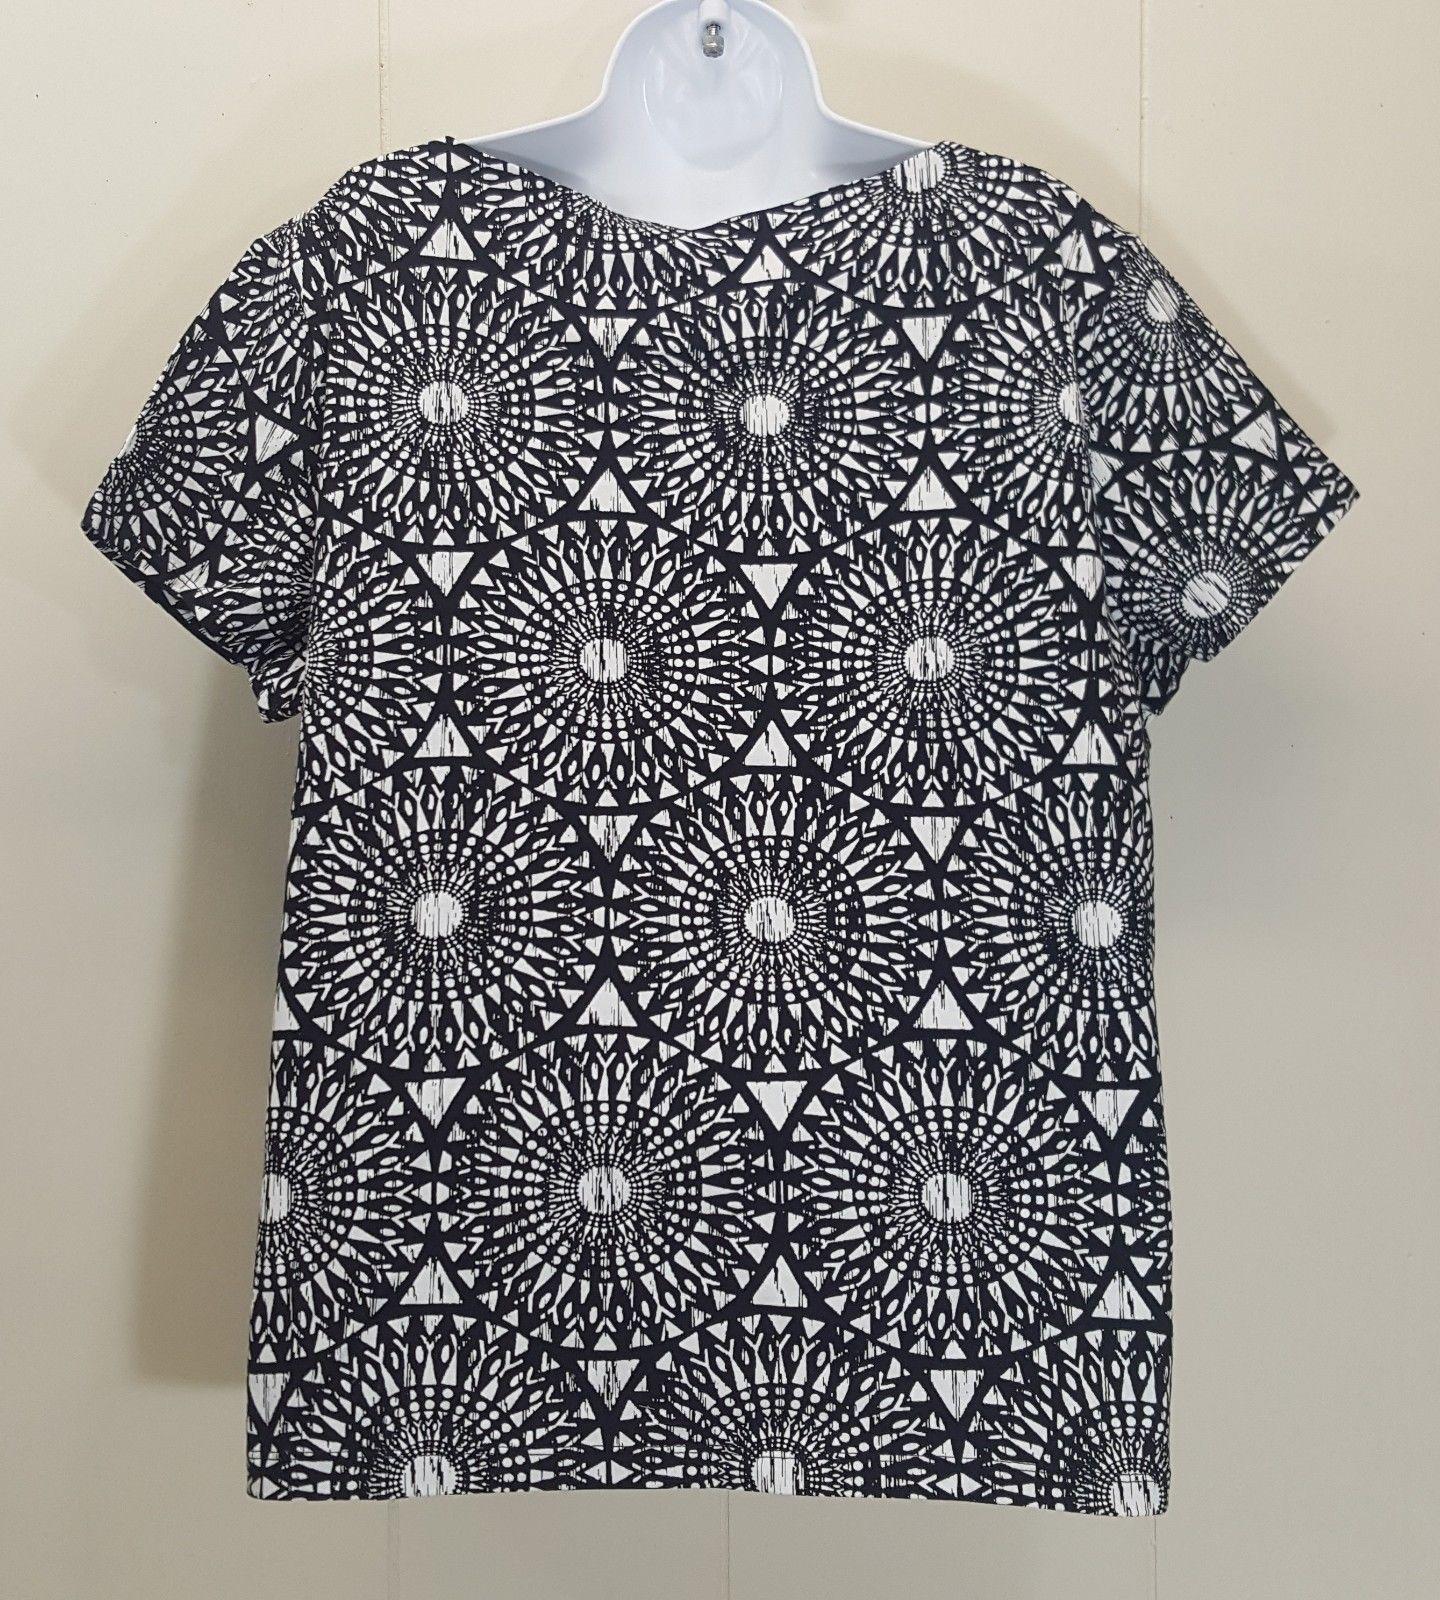 Ruby Rd Favorites Shirt Top Blouse XXL Black White Geometric Blue Jeweled Neck